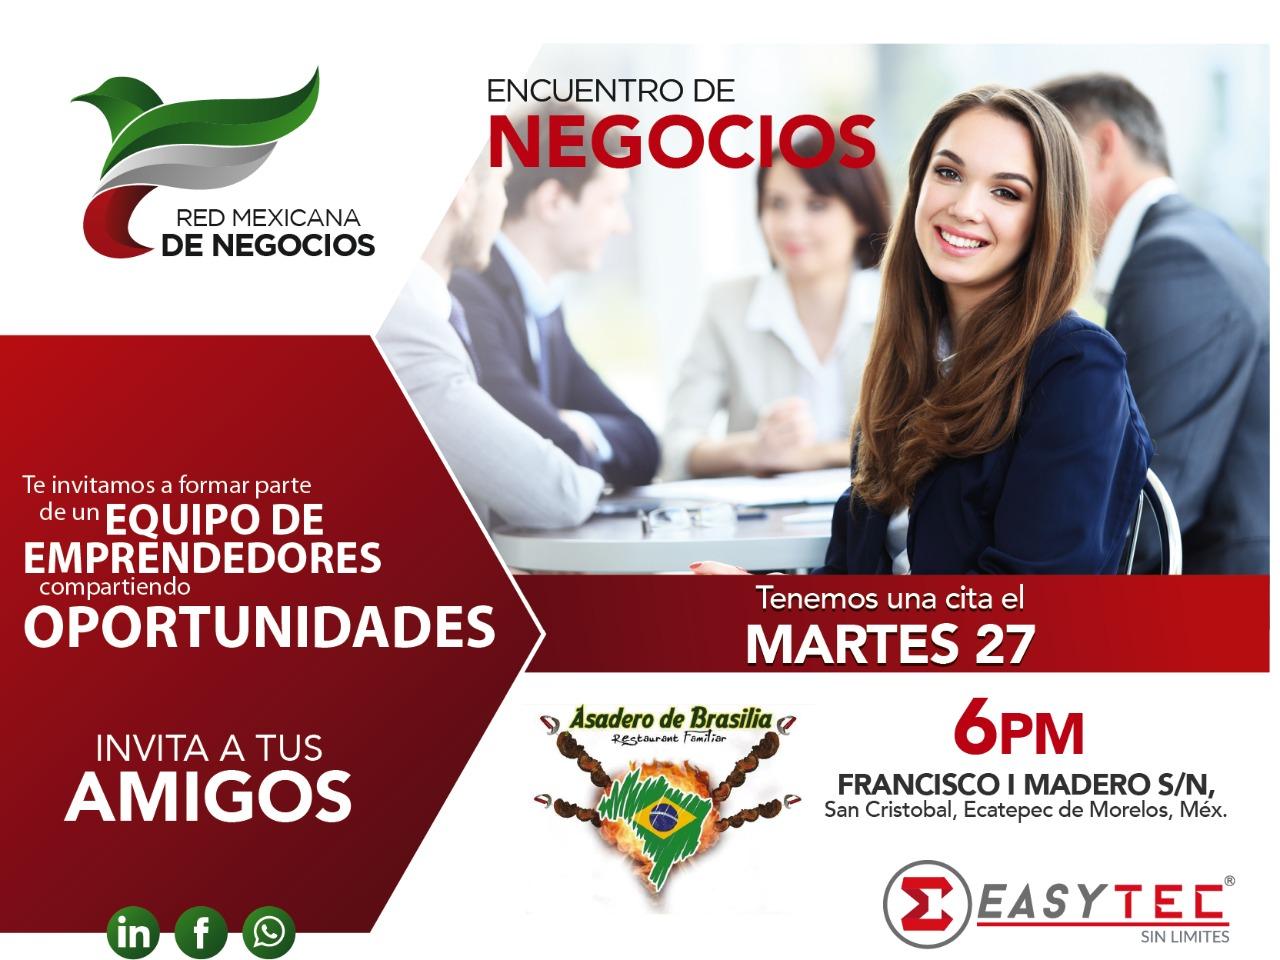 Encuentro_ecatepec_martes_27